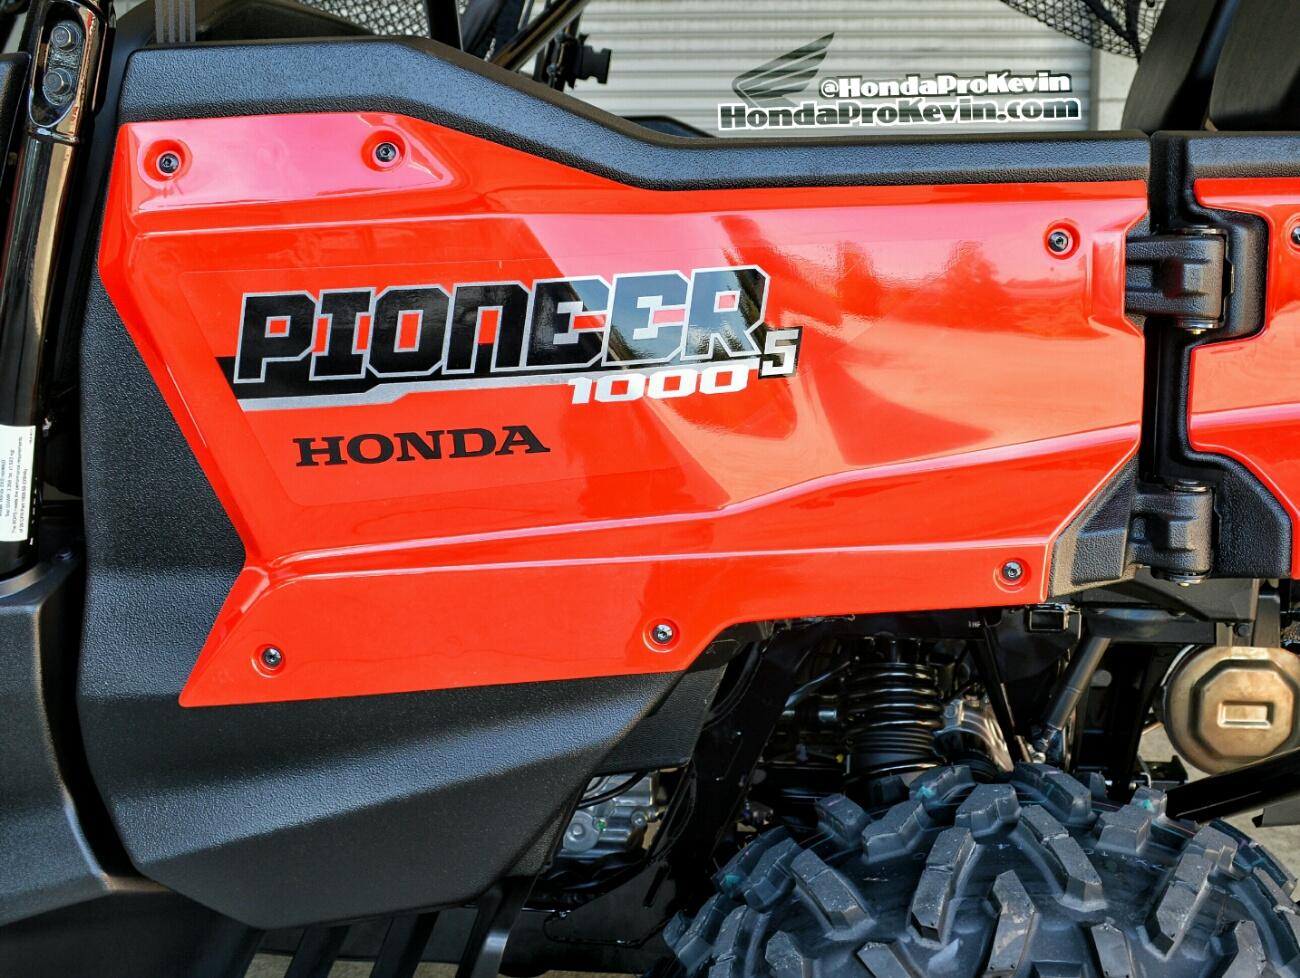 2018 Honda Pioneer 1000-5 Review / Specs - Side by Side ATV / UTV / SxS / Utility Vehicle 4x4 - SXS1000 - SXS10M5